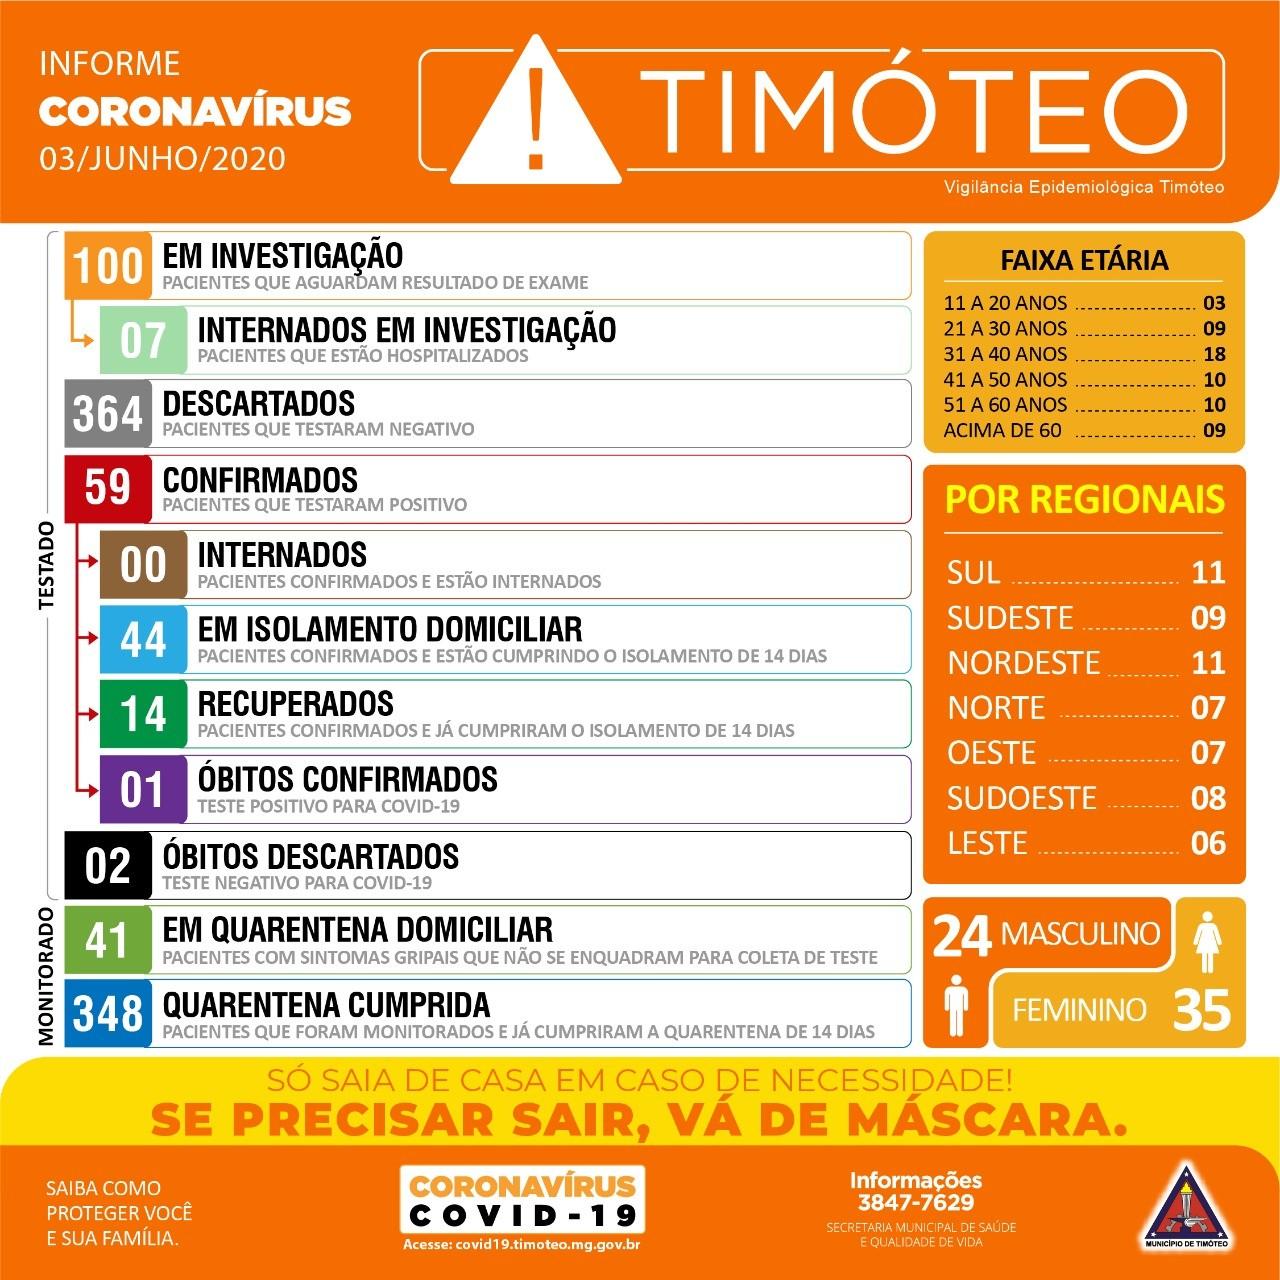 Prefeitura de Timóteo confirma quatro novos casos de Covid-19; município chega a 59 infectados